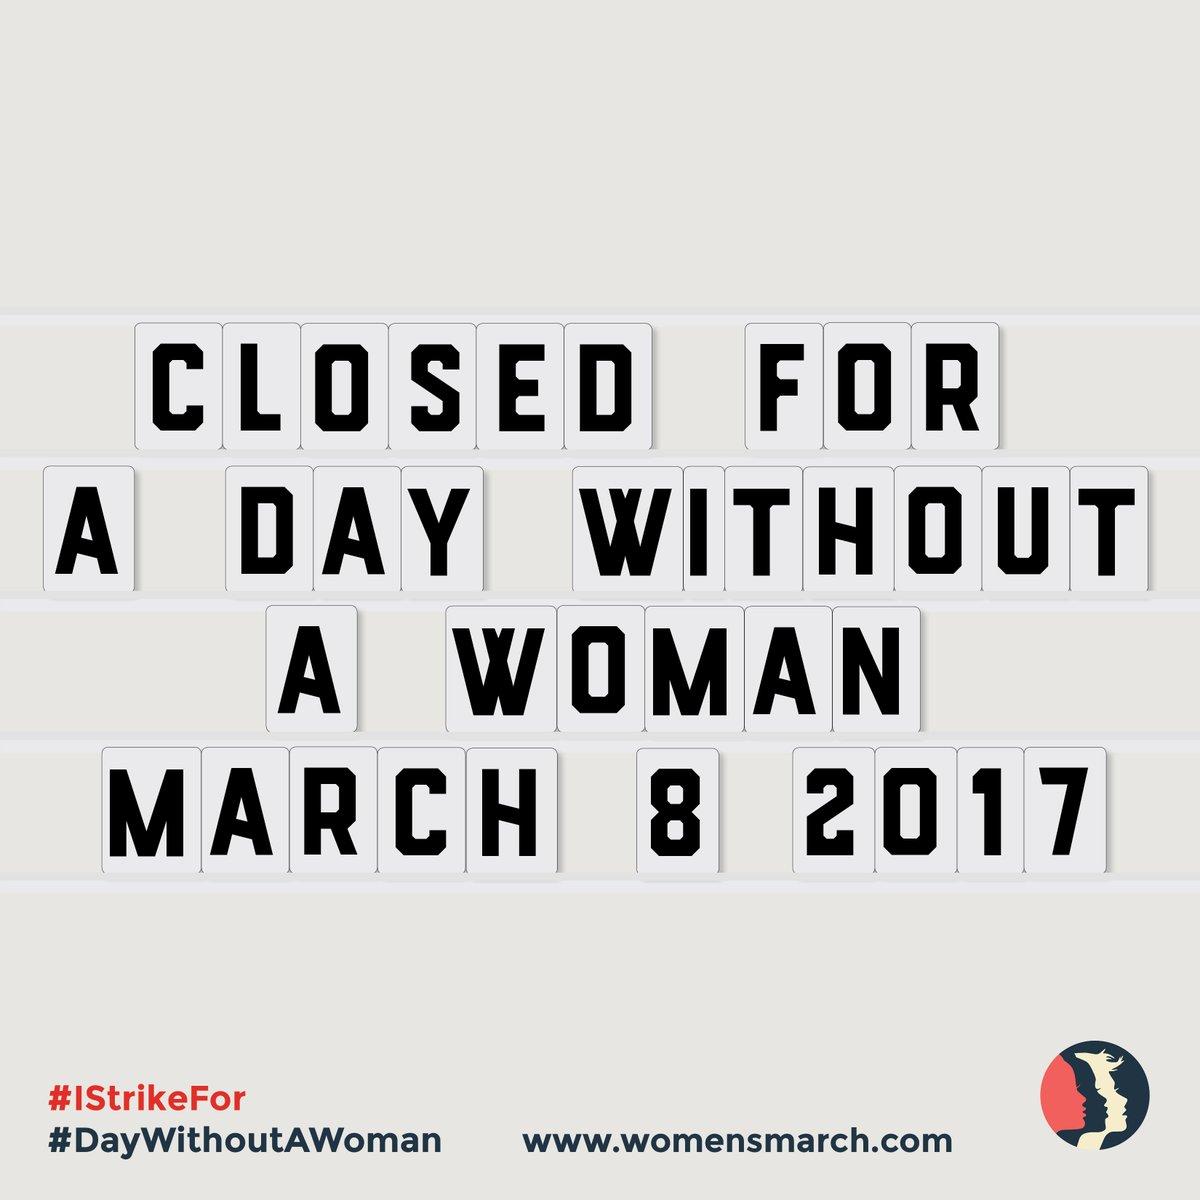 Lotto marzo #daywithoutawoman #nonunadimeno